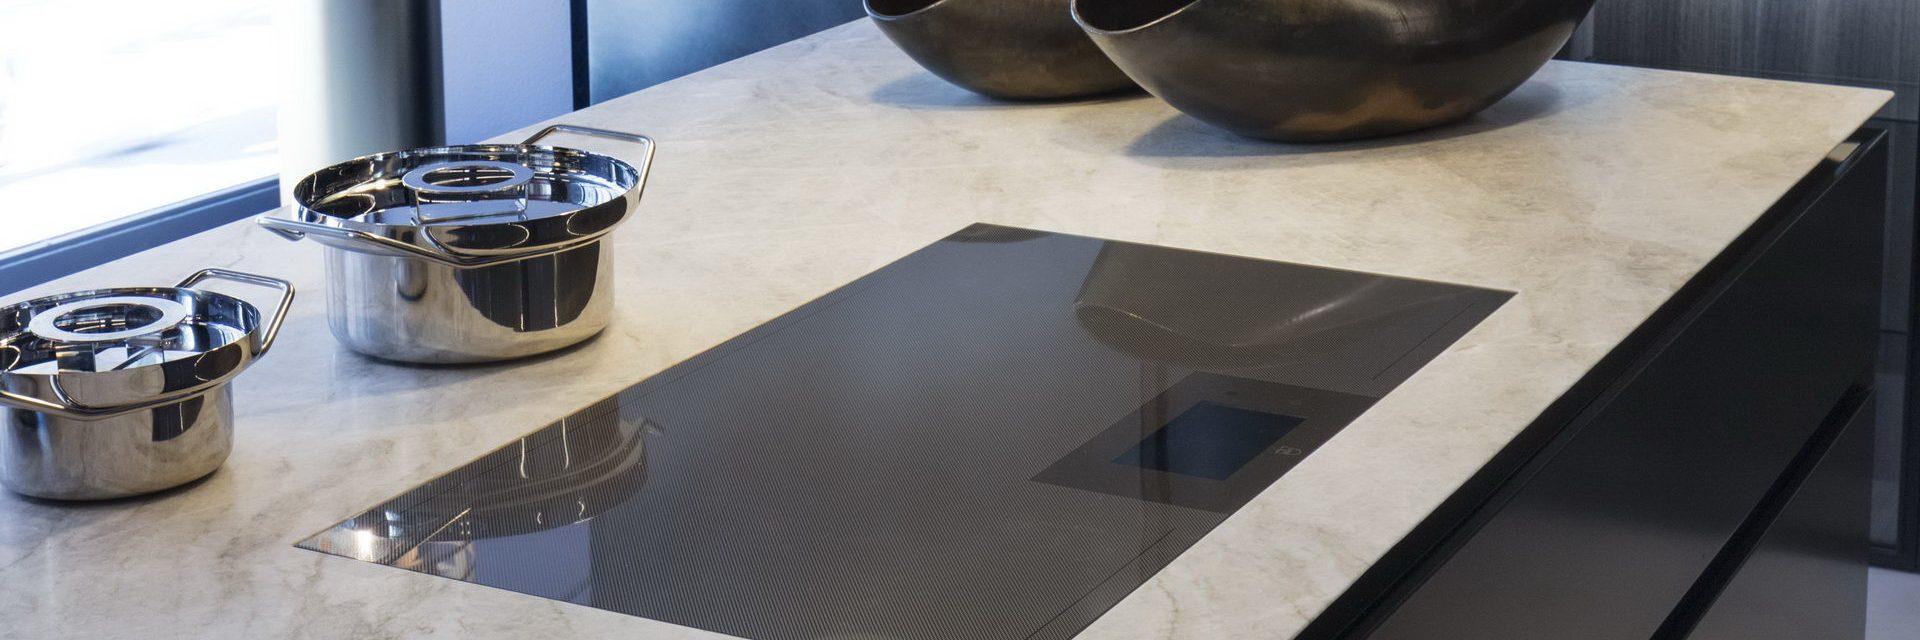 Cucine Moderne di Design Made in Italy - Binova Milano - Via ...